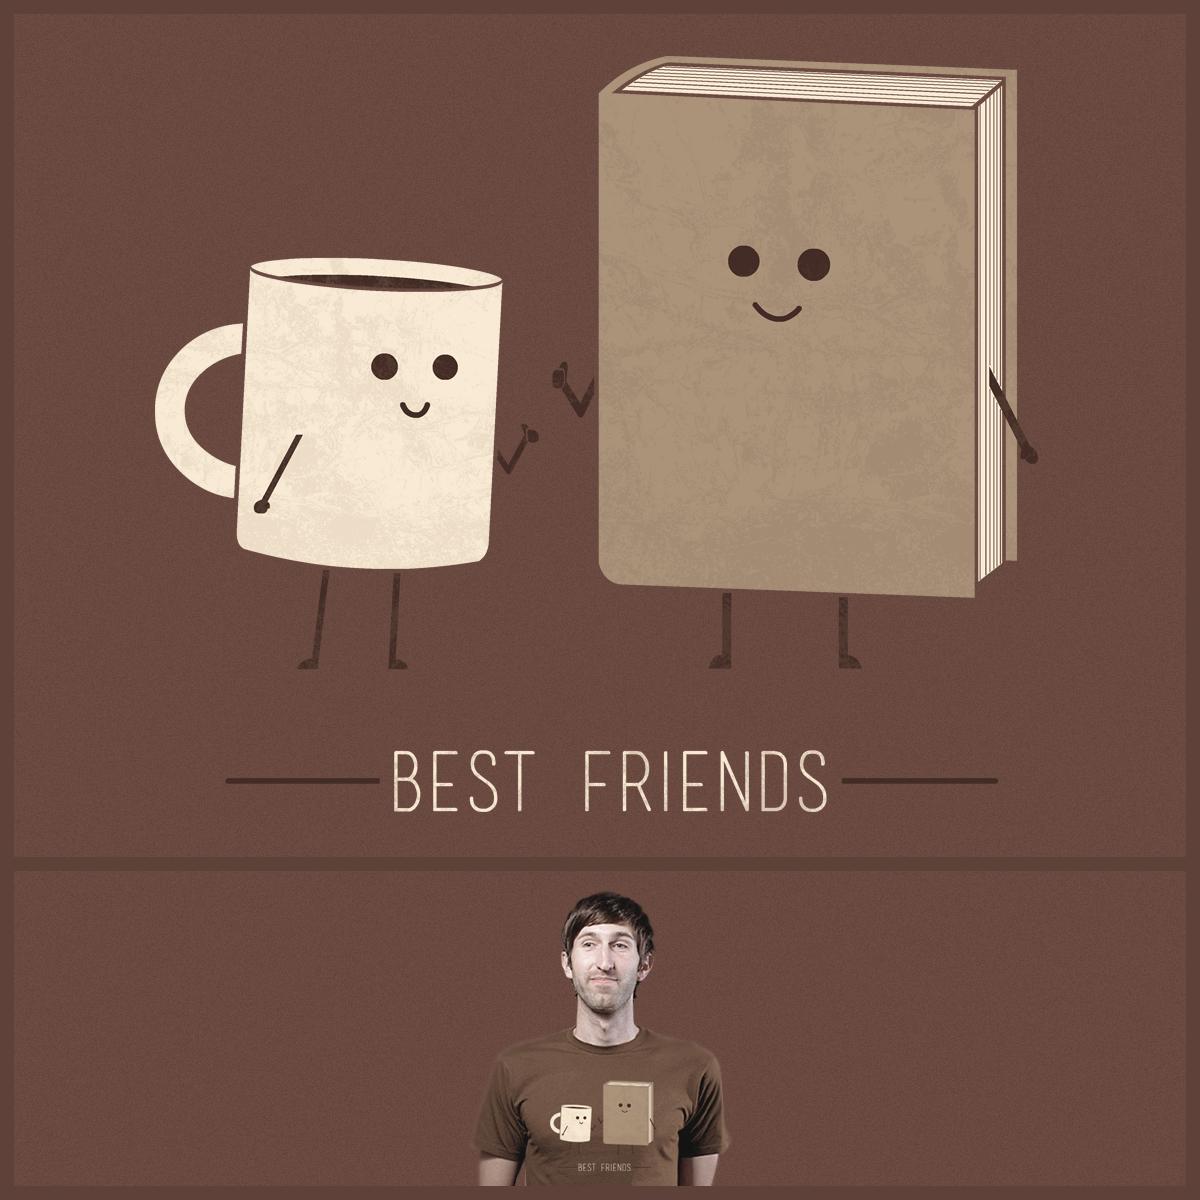 Best Friends by TeoZ on Threadless